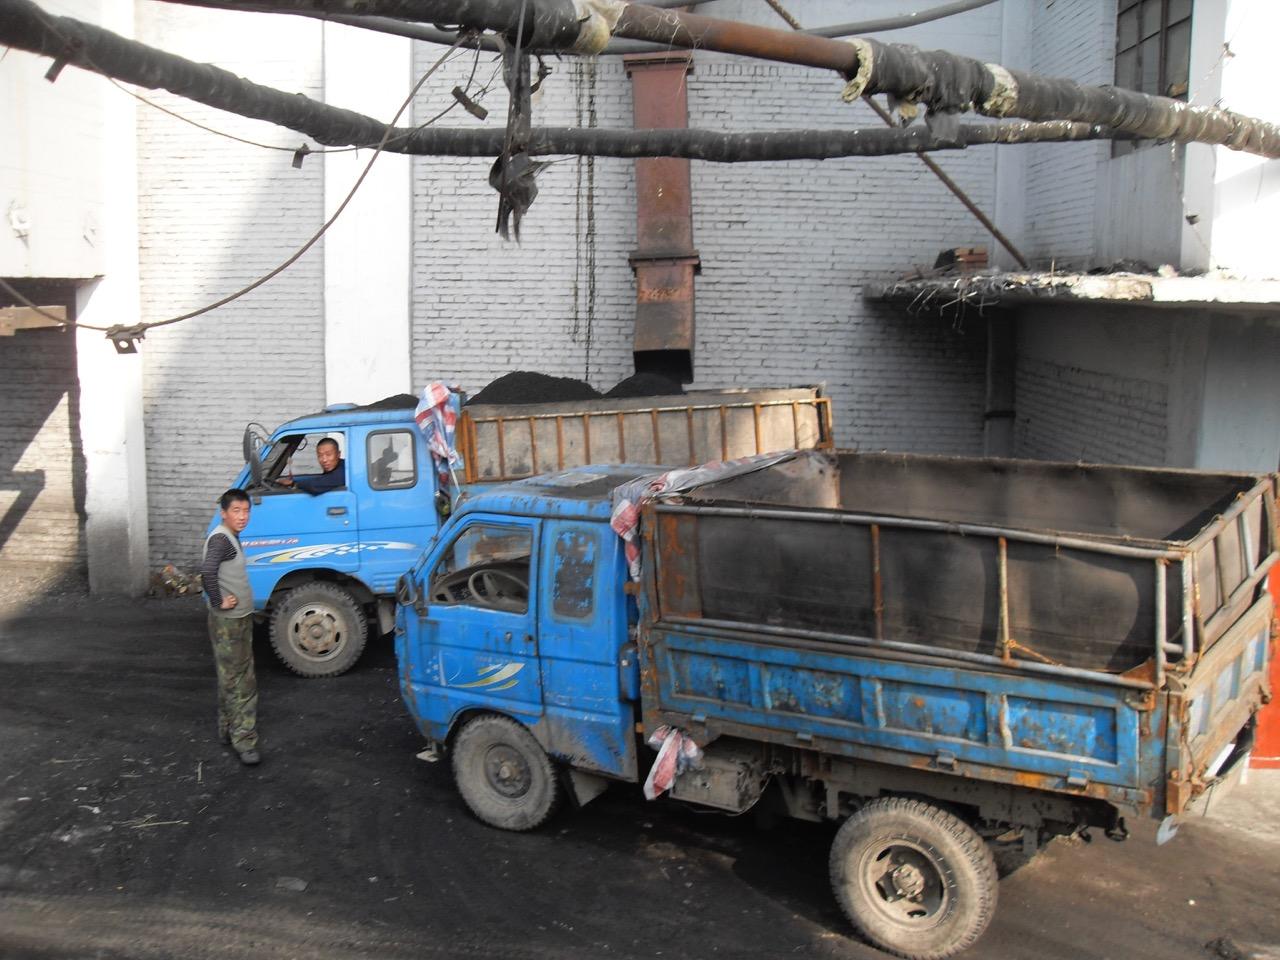 China coal trucks loading up in Shanxi province